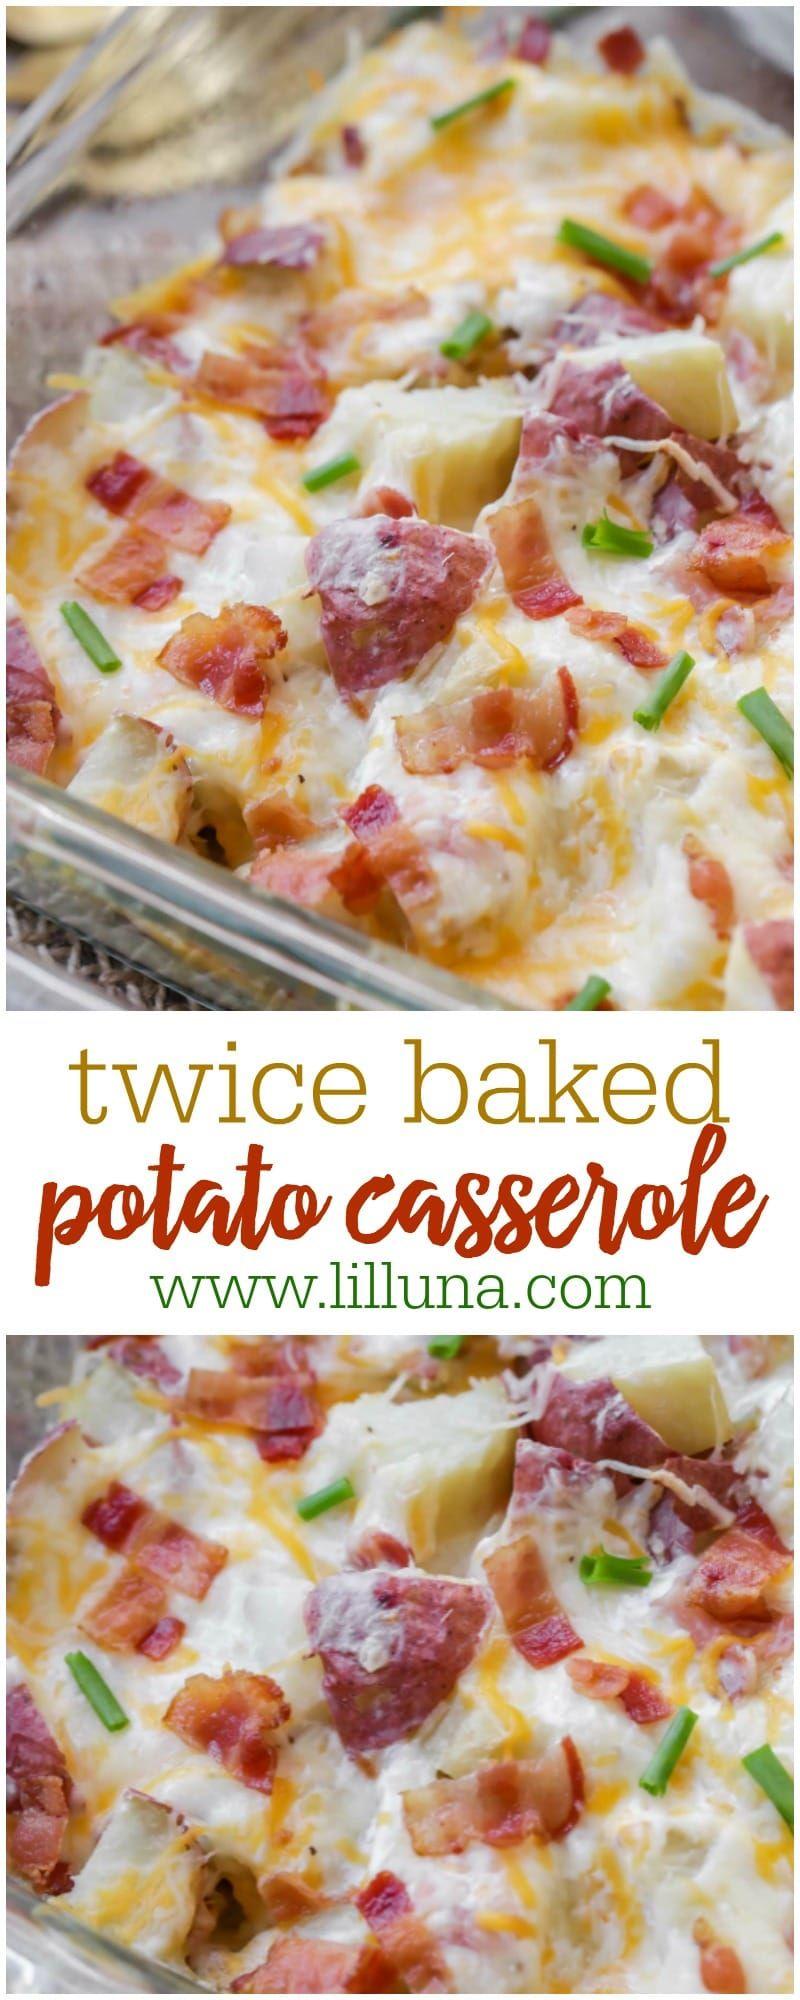 Twice Baked Potato Casserole Recipe Video Lil Luna Recipe Twice Baked Potatoes Casserole Potatoe Casserole Recipes Baked Potato Casserole